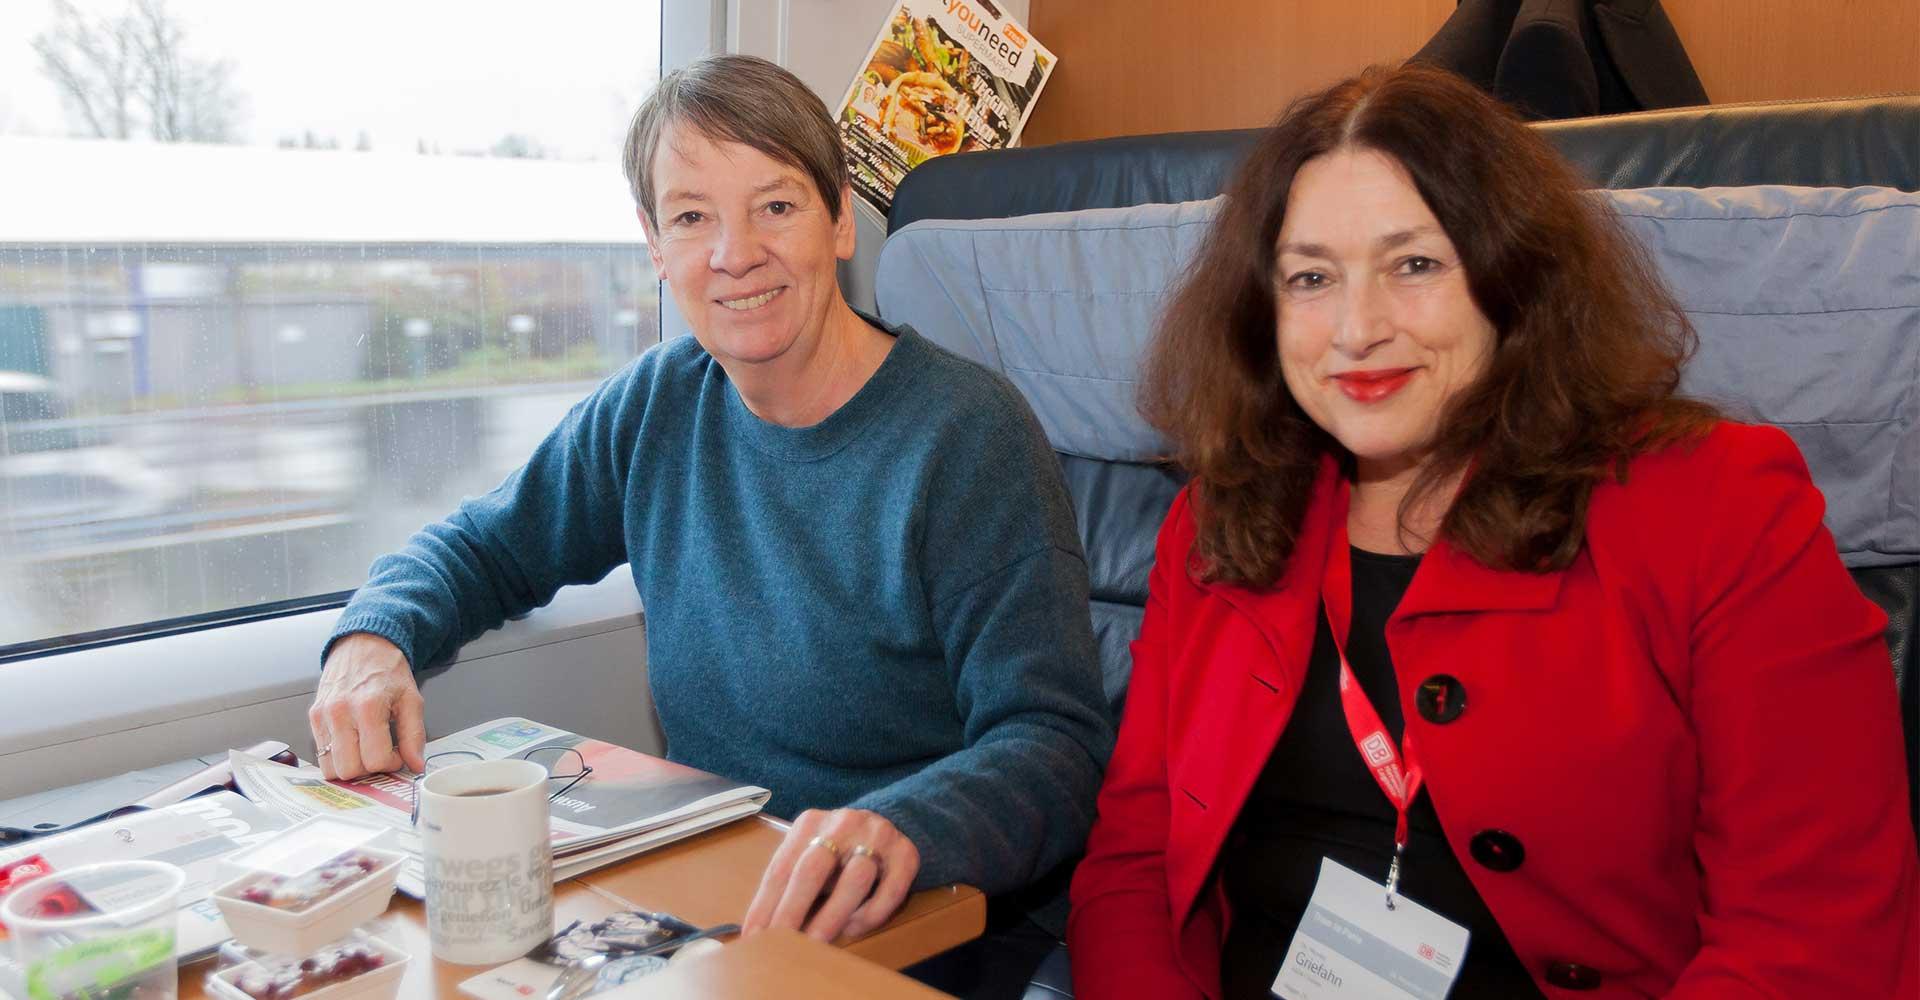 AIDA Umweltdirektorin Dr. Monika Griefahn mit Bundesumweltministerin Dr. Barbara Hendricks © Bjoern Foerster